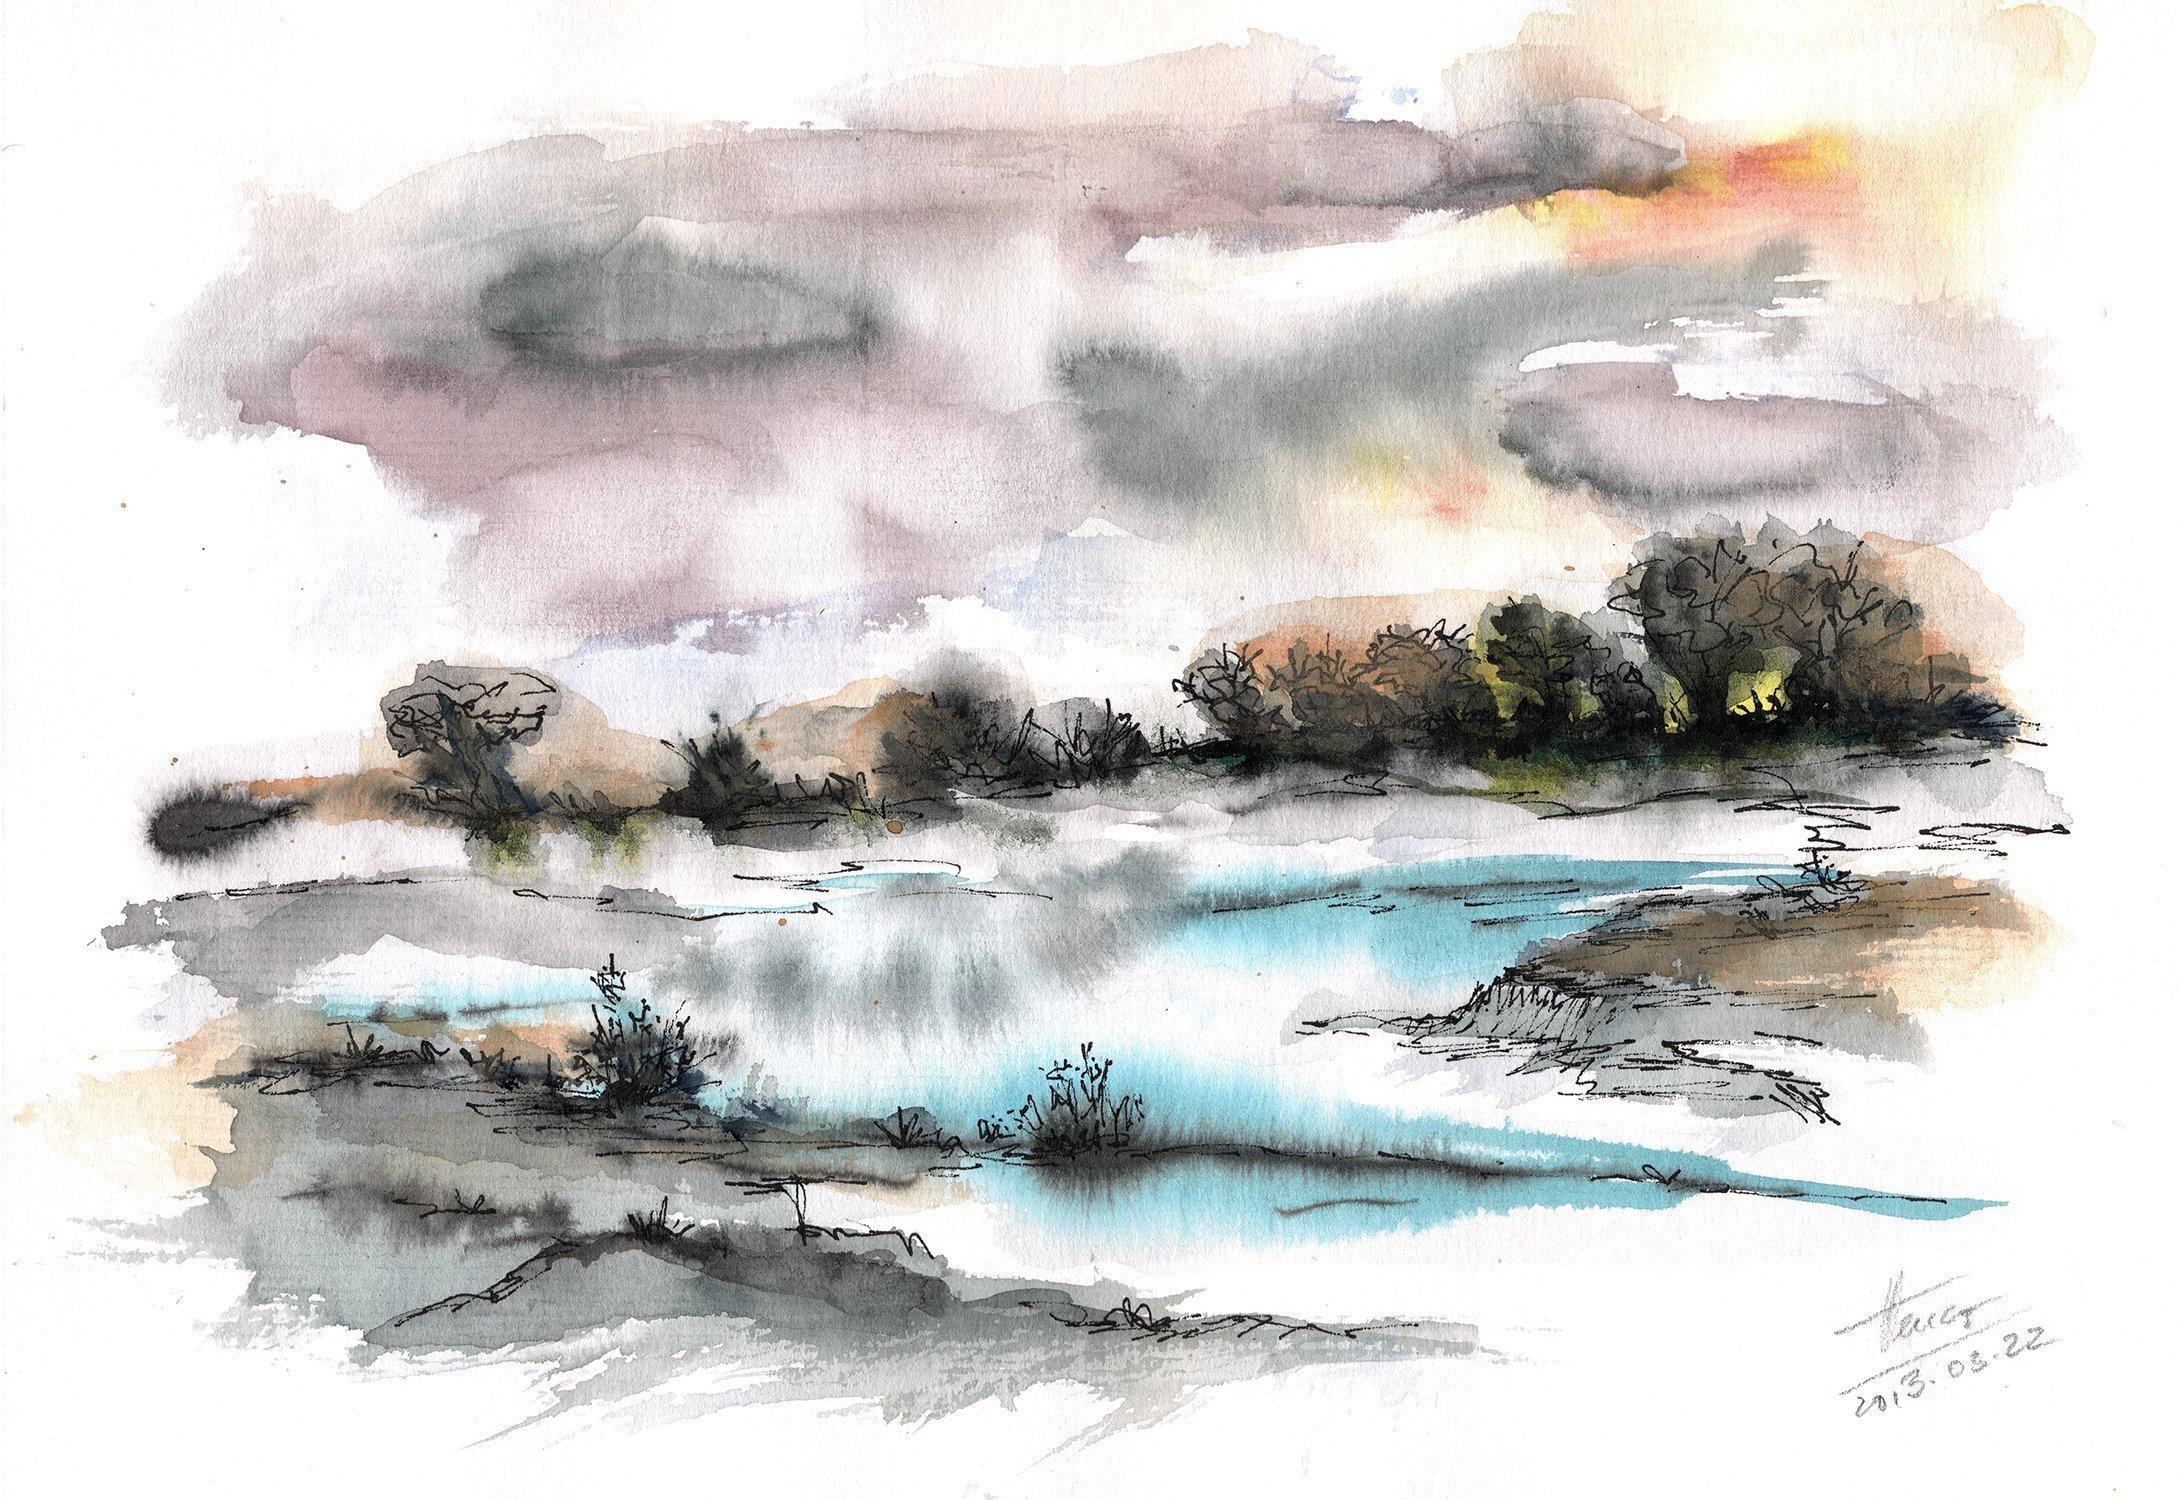 Artist: Aniko Hencz - Title: Frozen river - Medium: Watercolor - Year: 2013